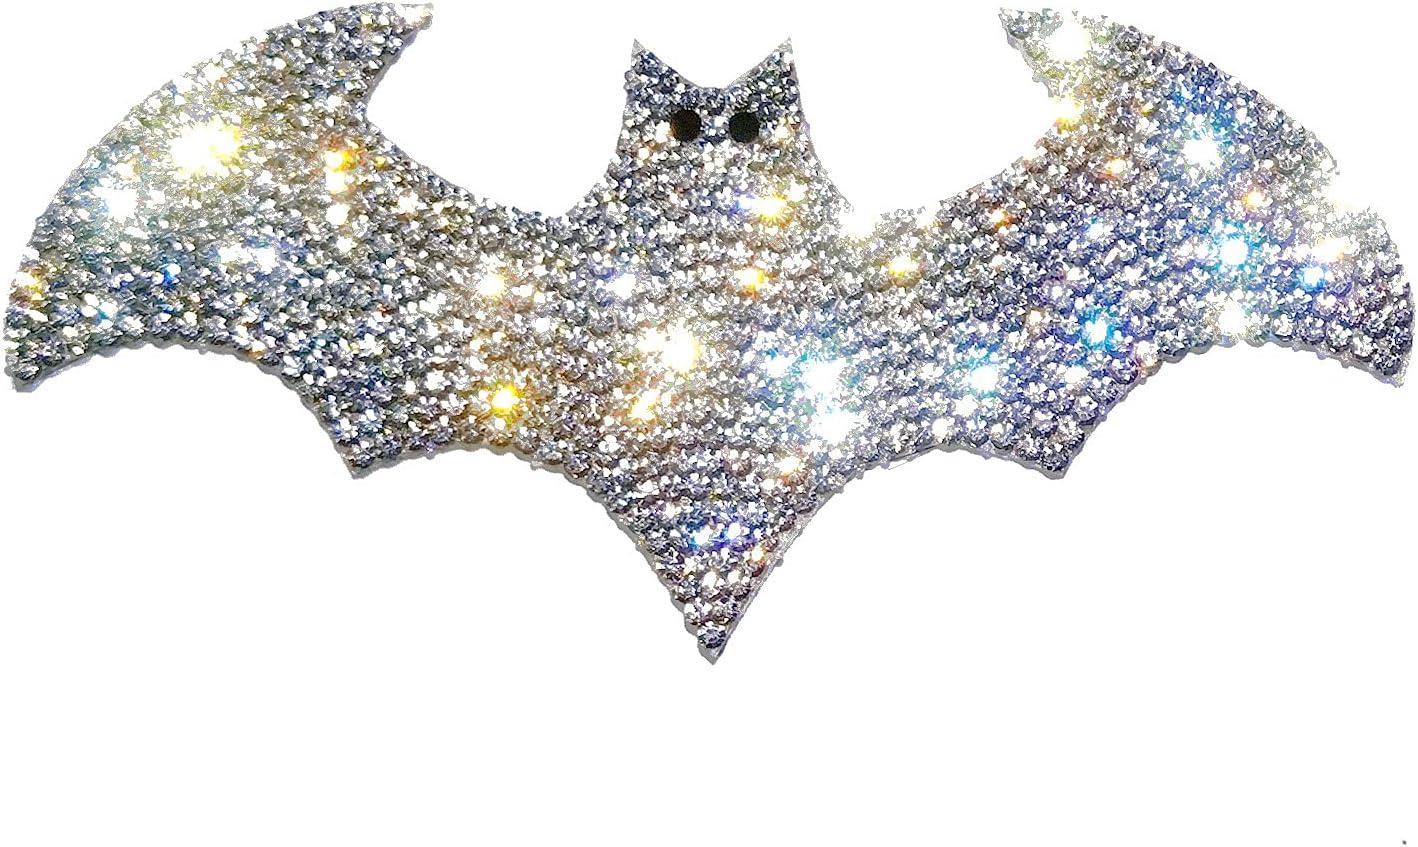 Silver Bling Bat Car Decal, Sparkly Crystal Rhinestone Waterproof Sci-fi Sticker 4.5'' Height